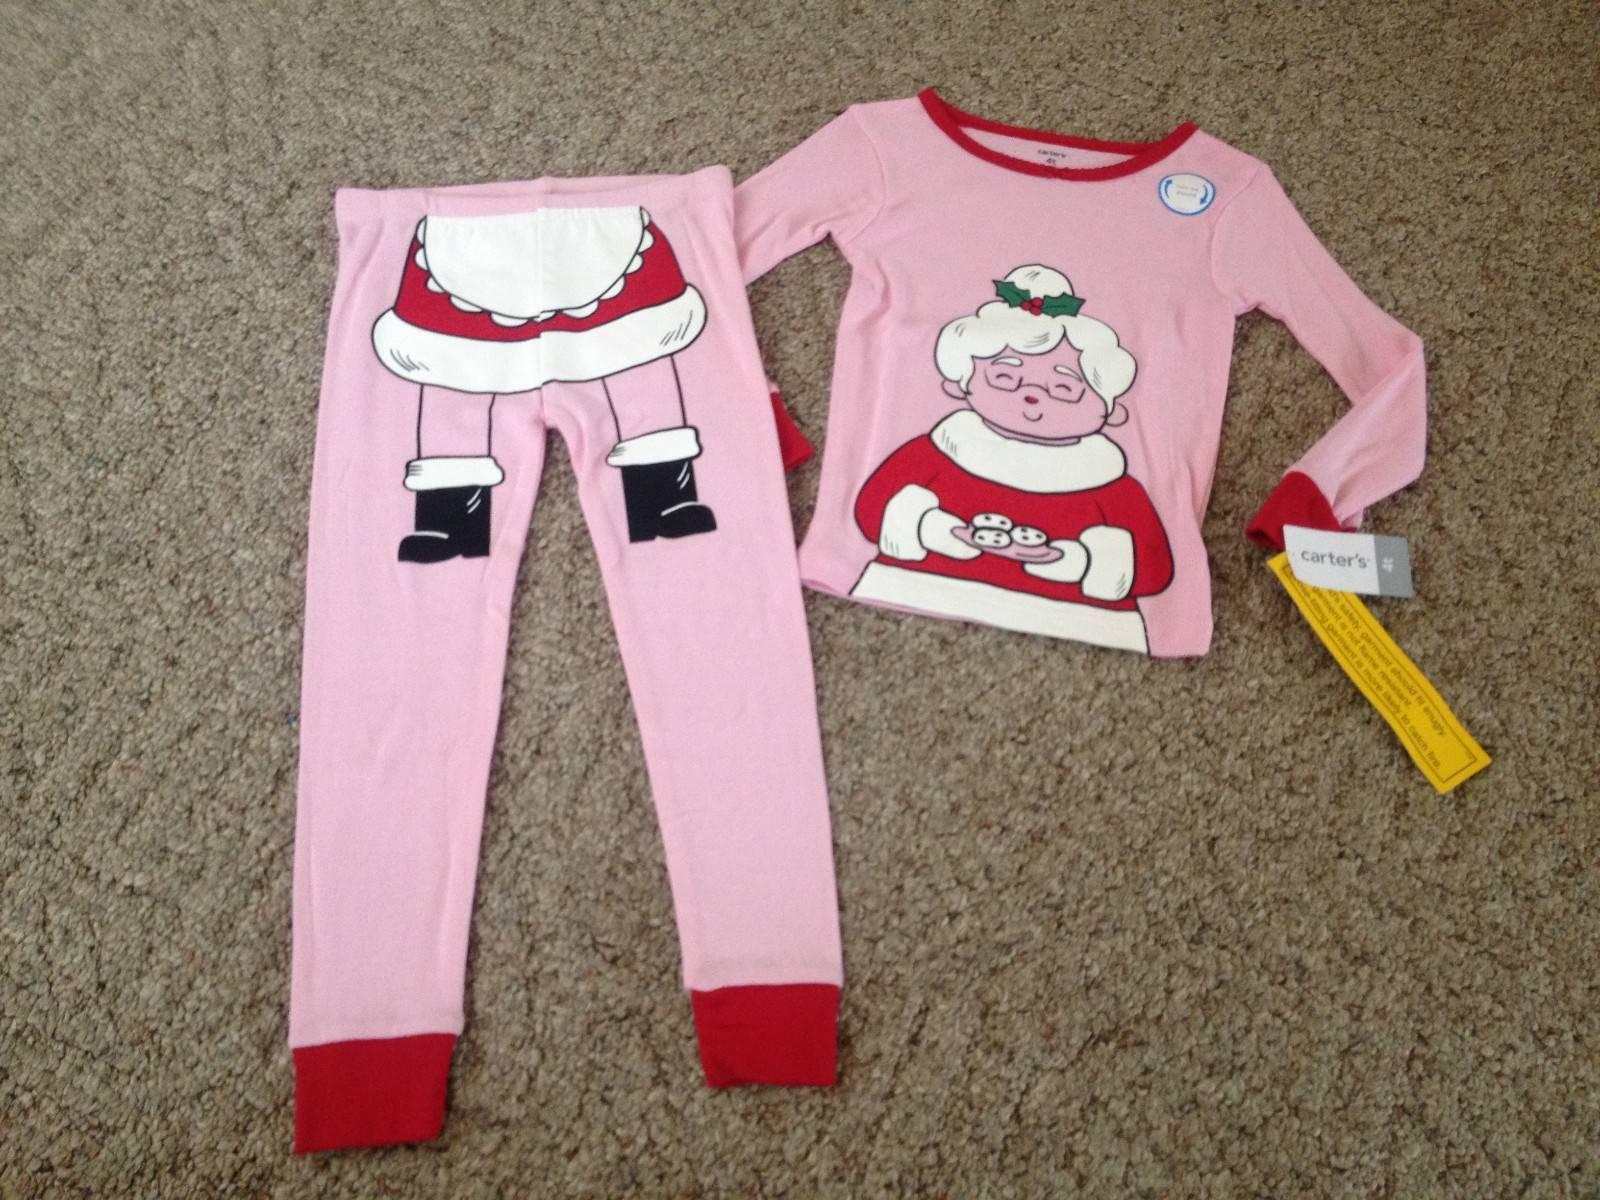 fbff900aa Buy Carter s Girls 2 Piece Santa Pajamas Pink Size 4t online